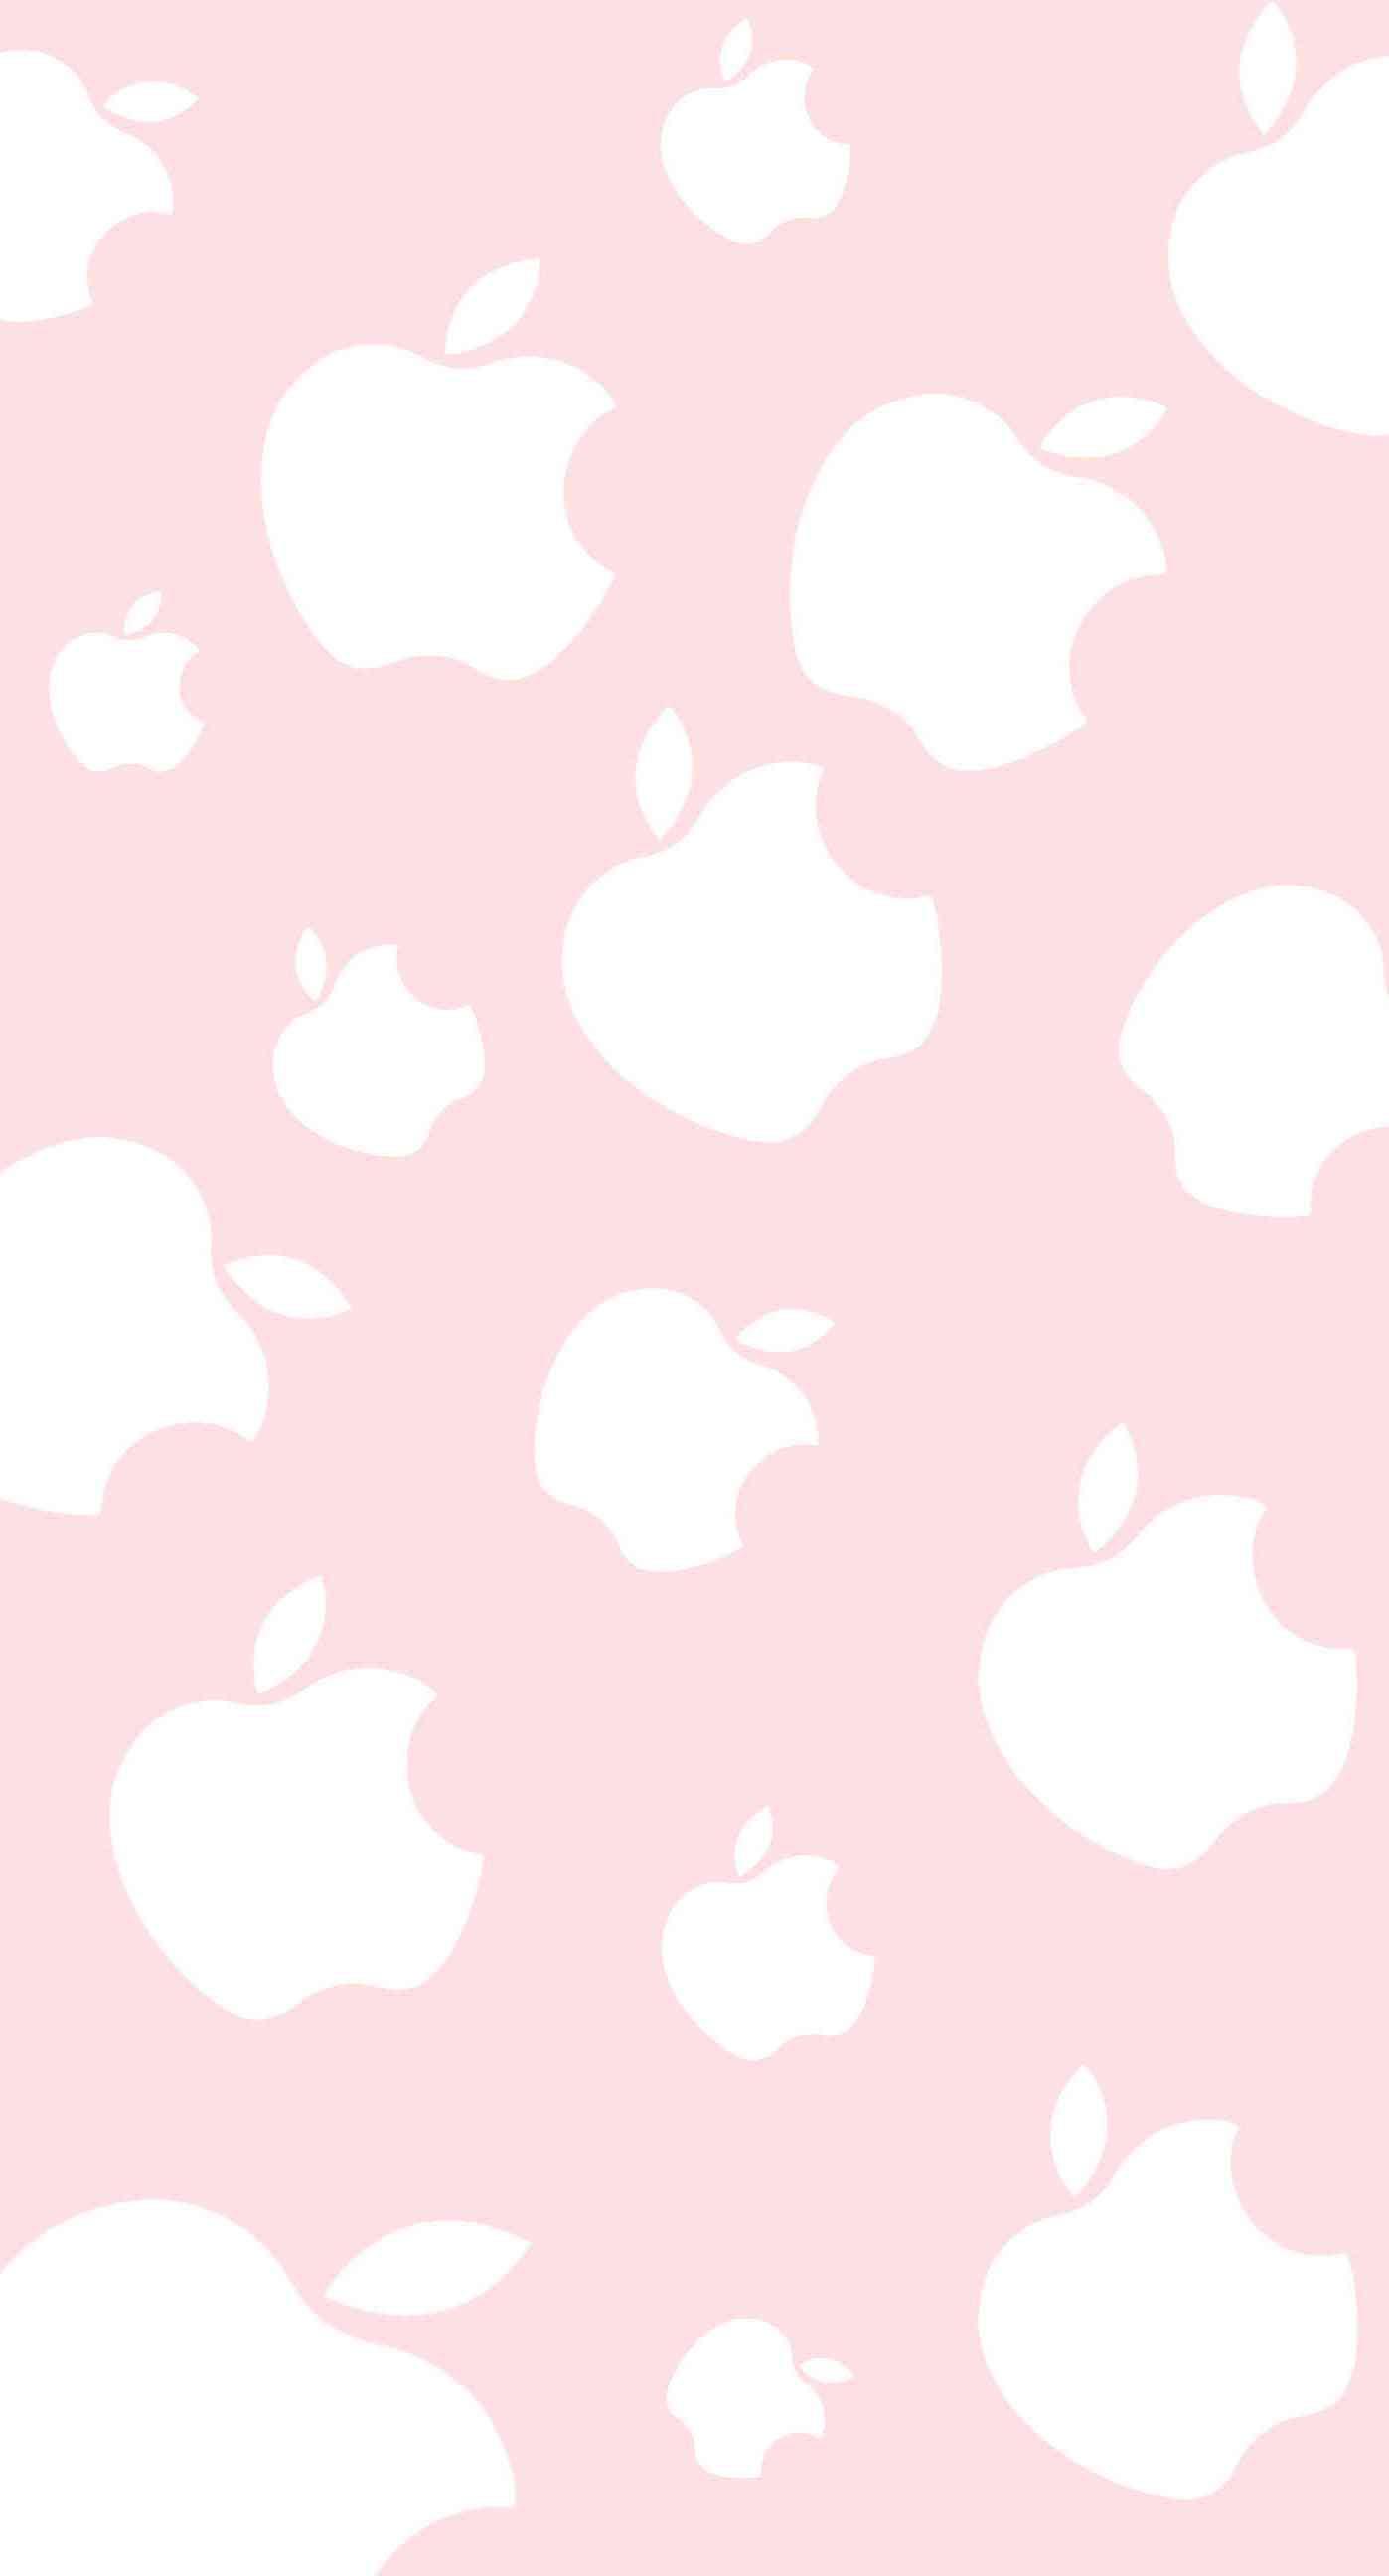 Gambar Wallpaper Lucu Warna Pink